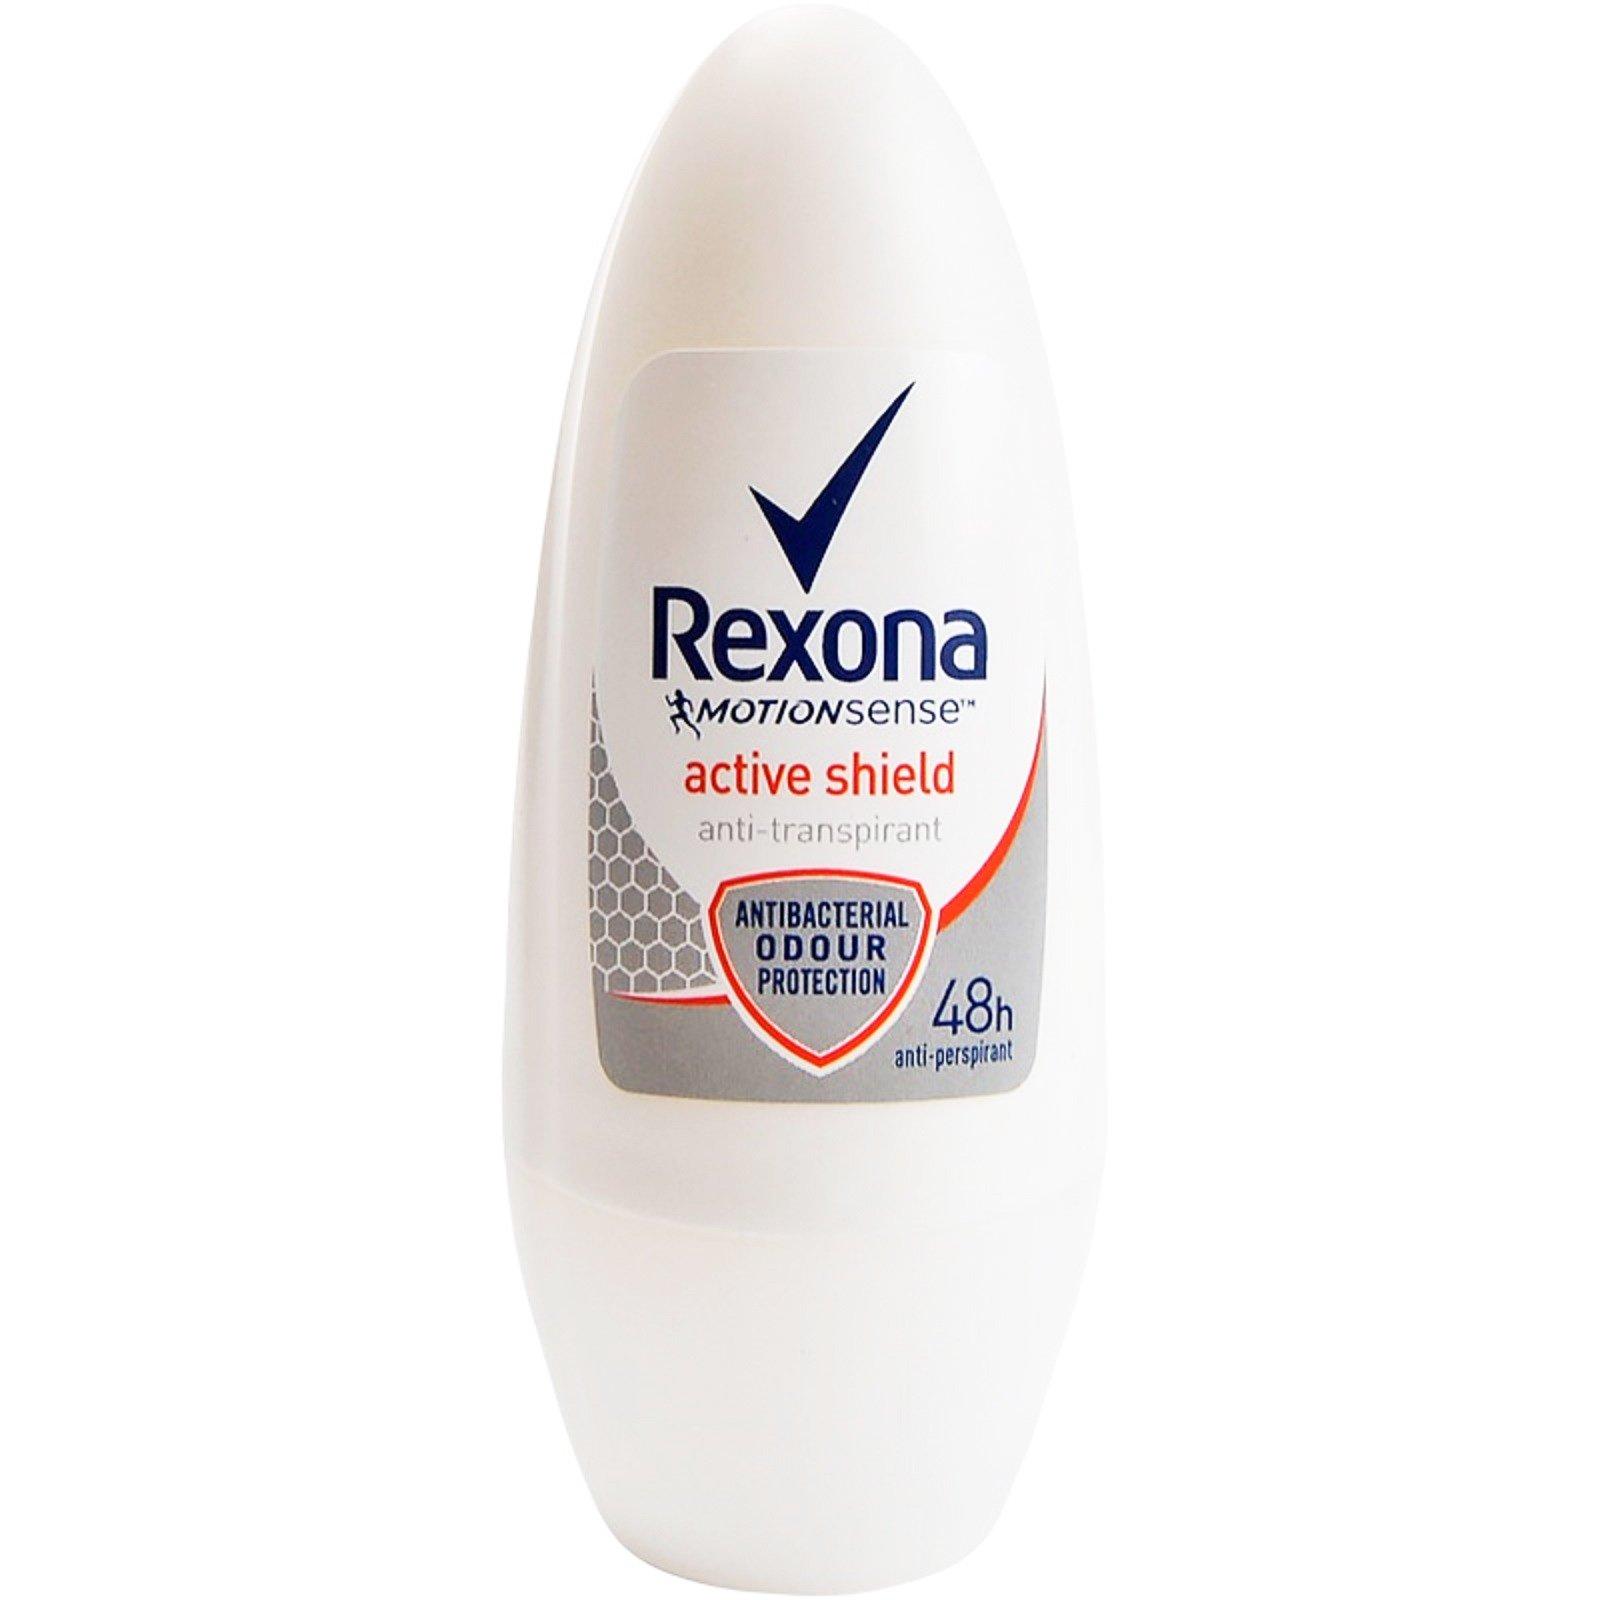 Rexona Anti-Transpirant Roll On Active Shield 48h Αποσμητικό, 48ωρη Προστασία από την Κακοσμία & τα Βακτήρια 50ml